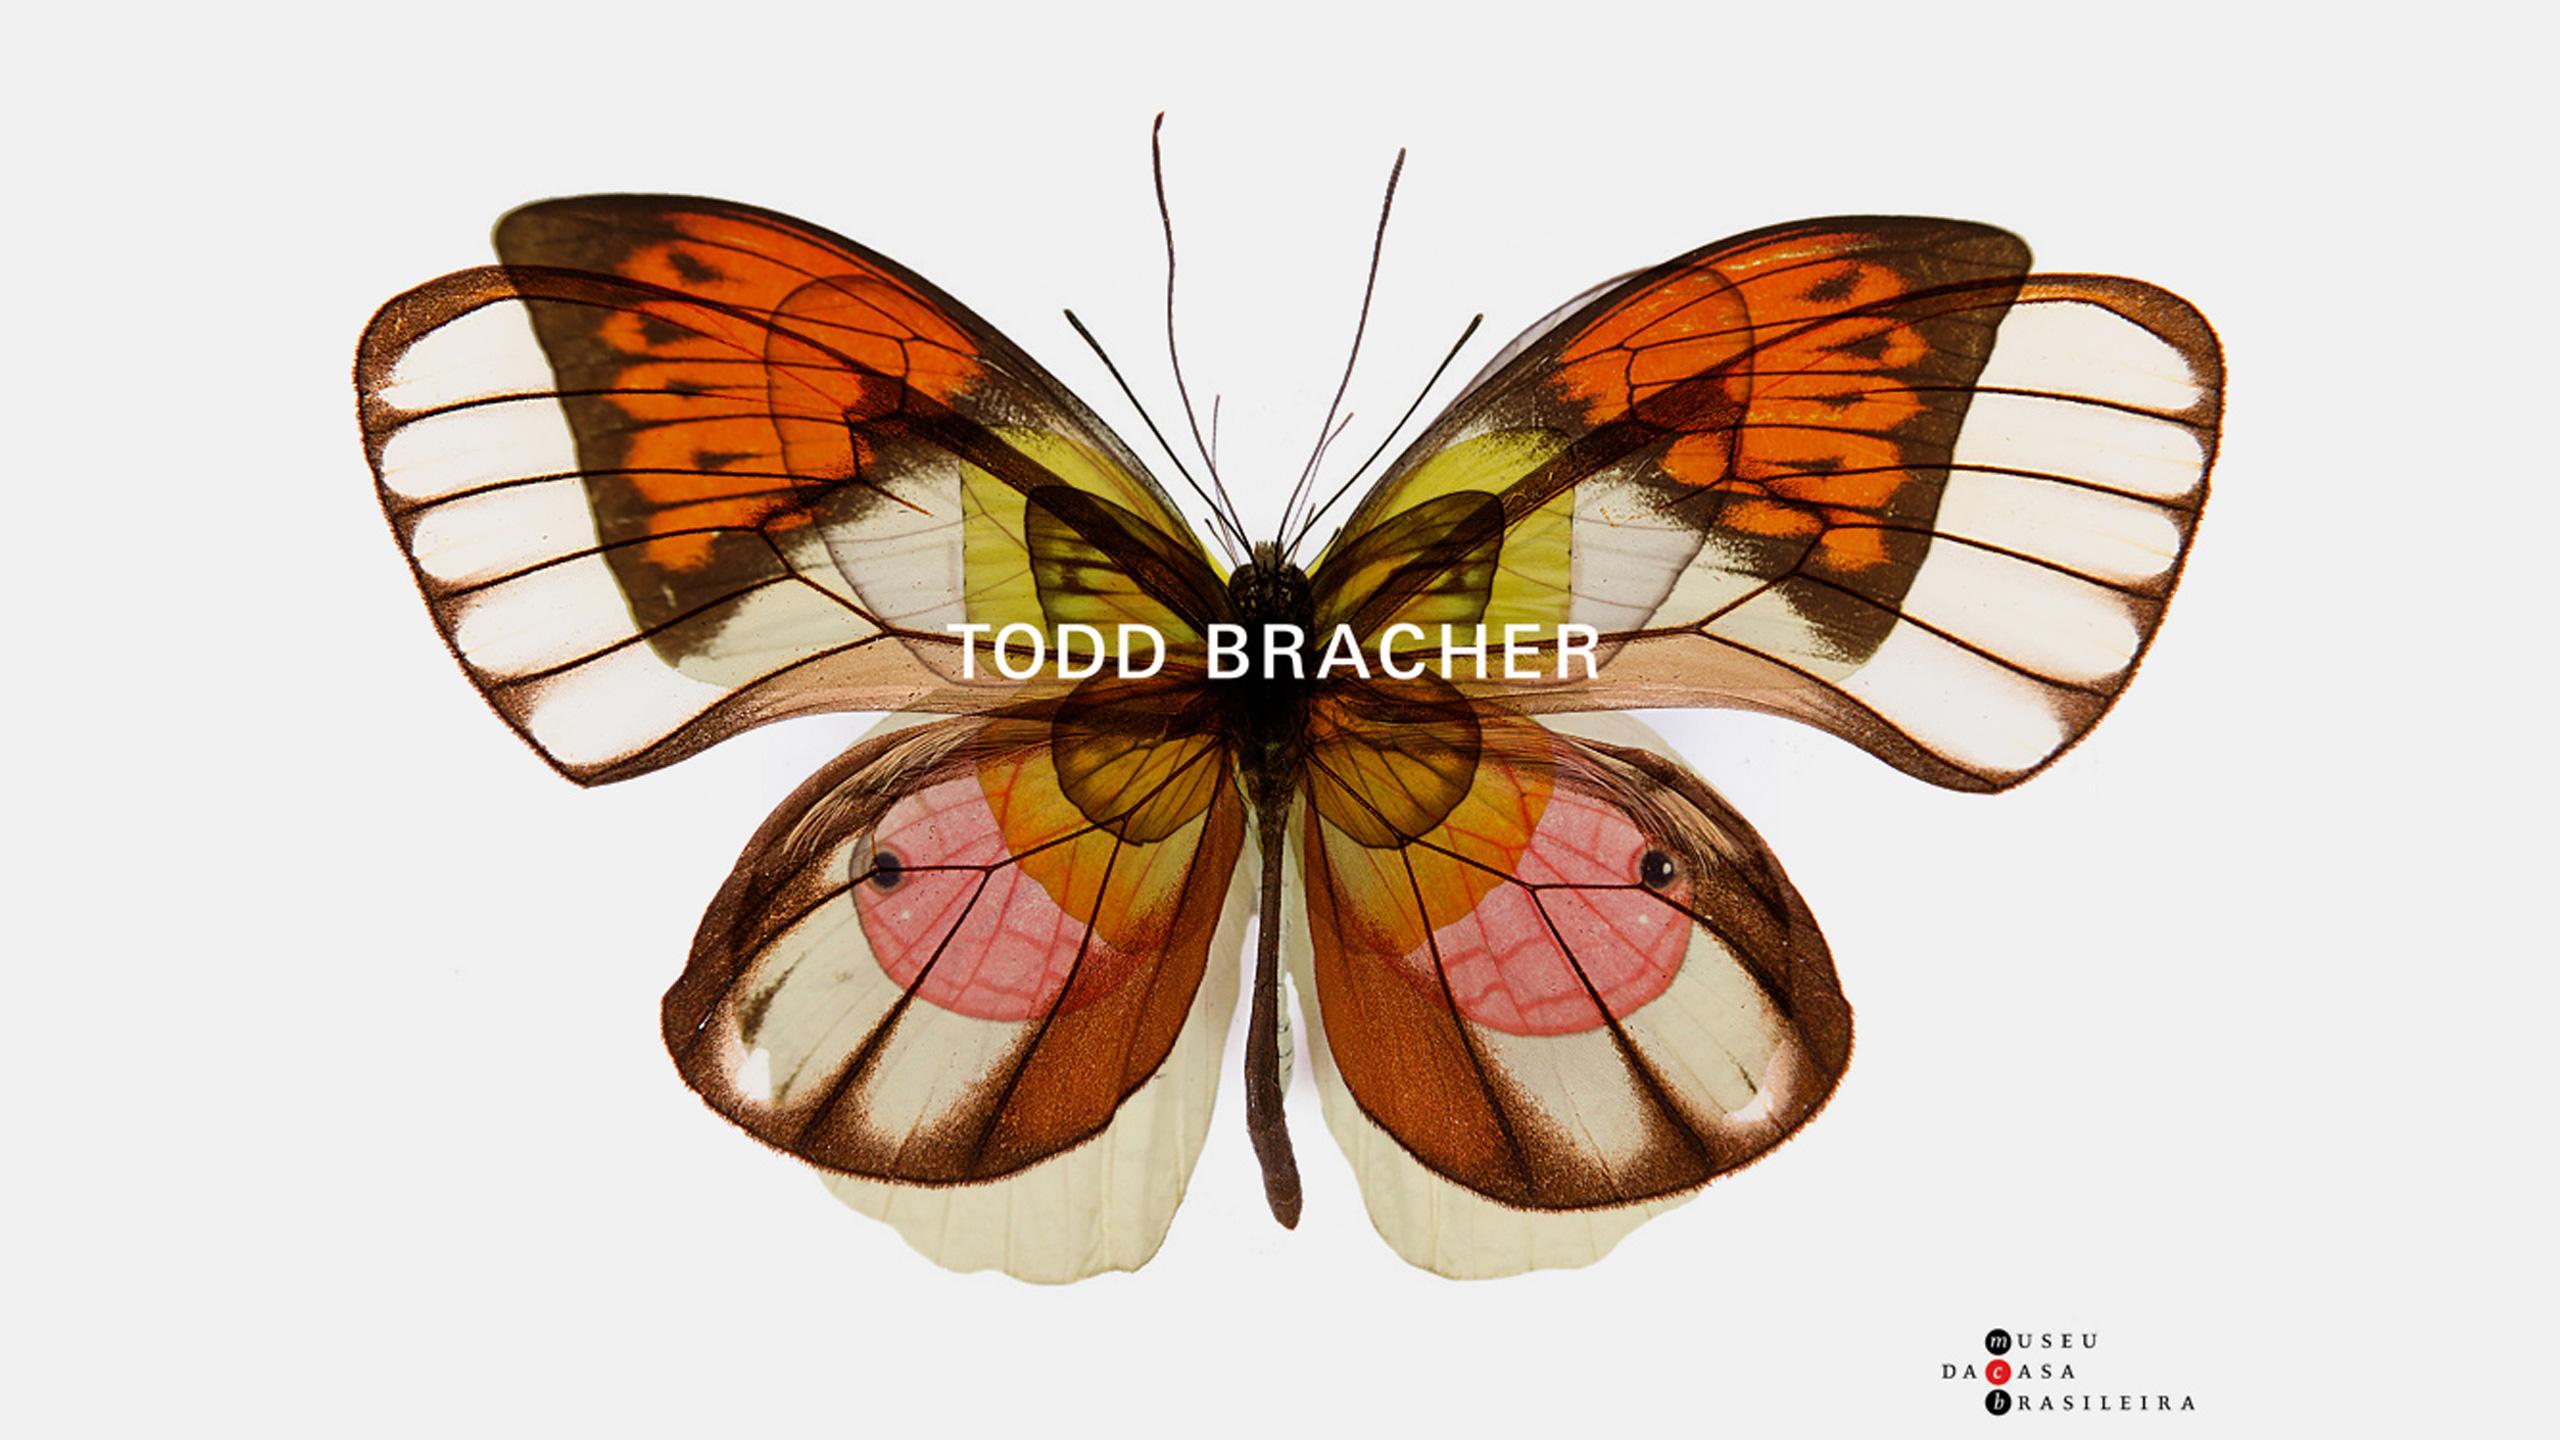 Todd Bracher Retrospective Opens in Brasil